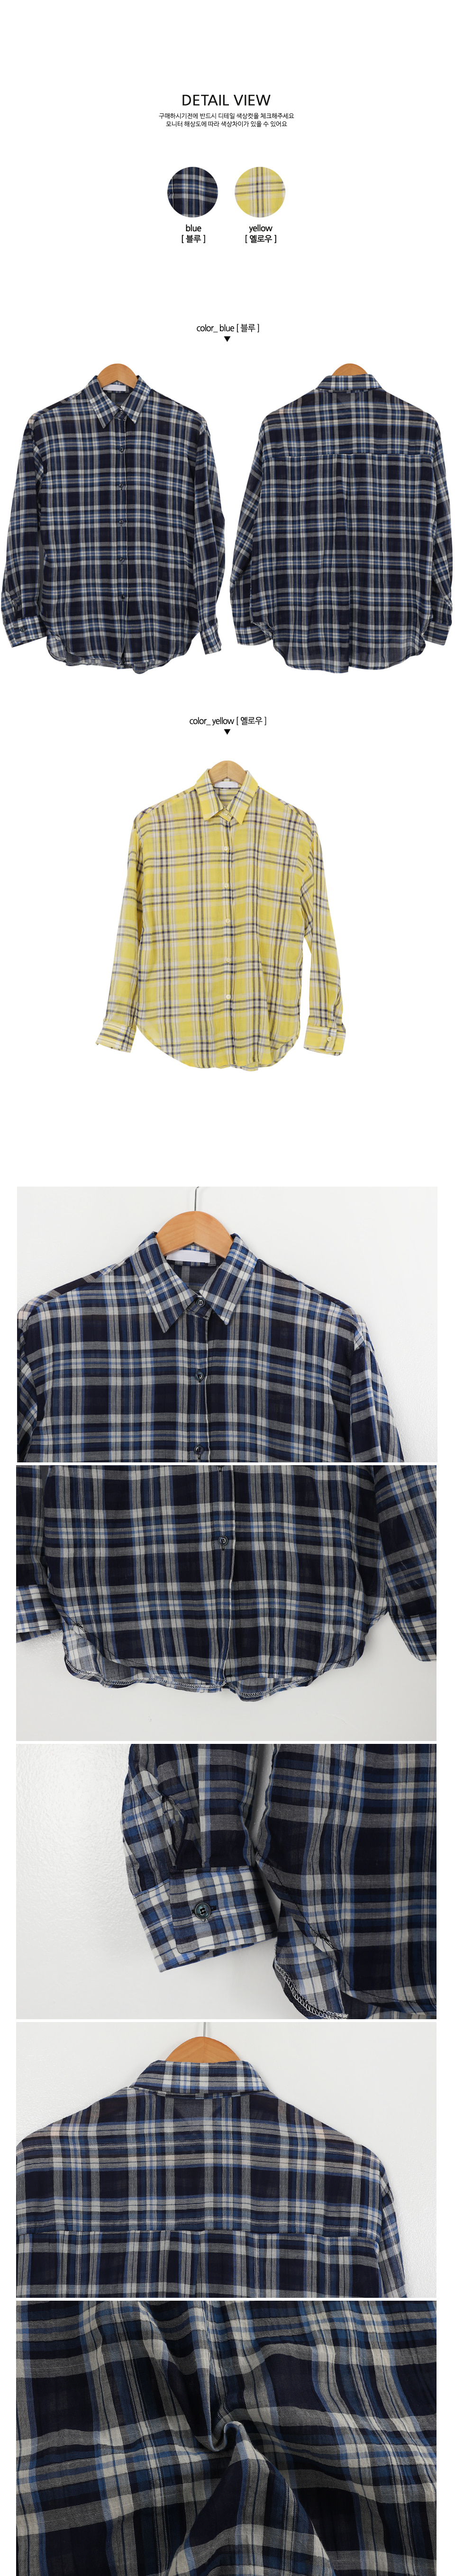 Matty check shirt